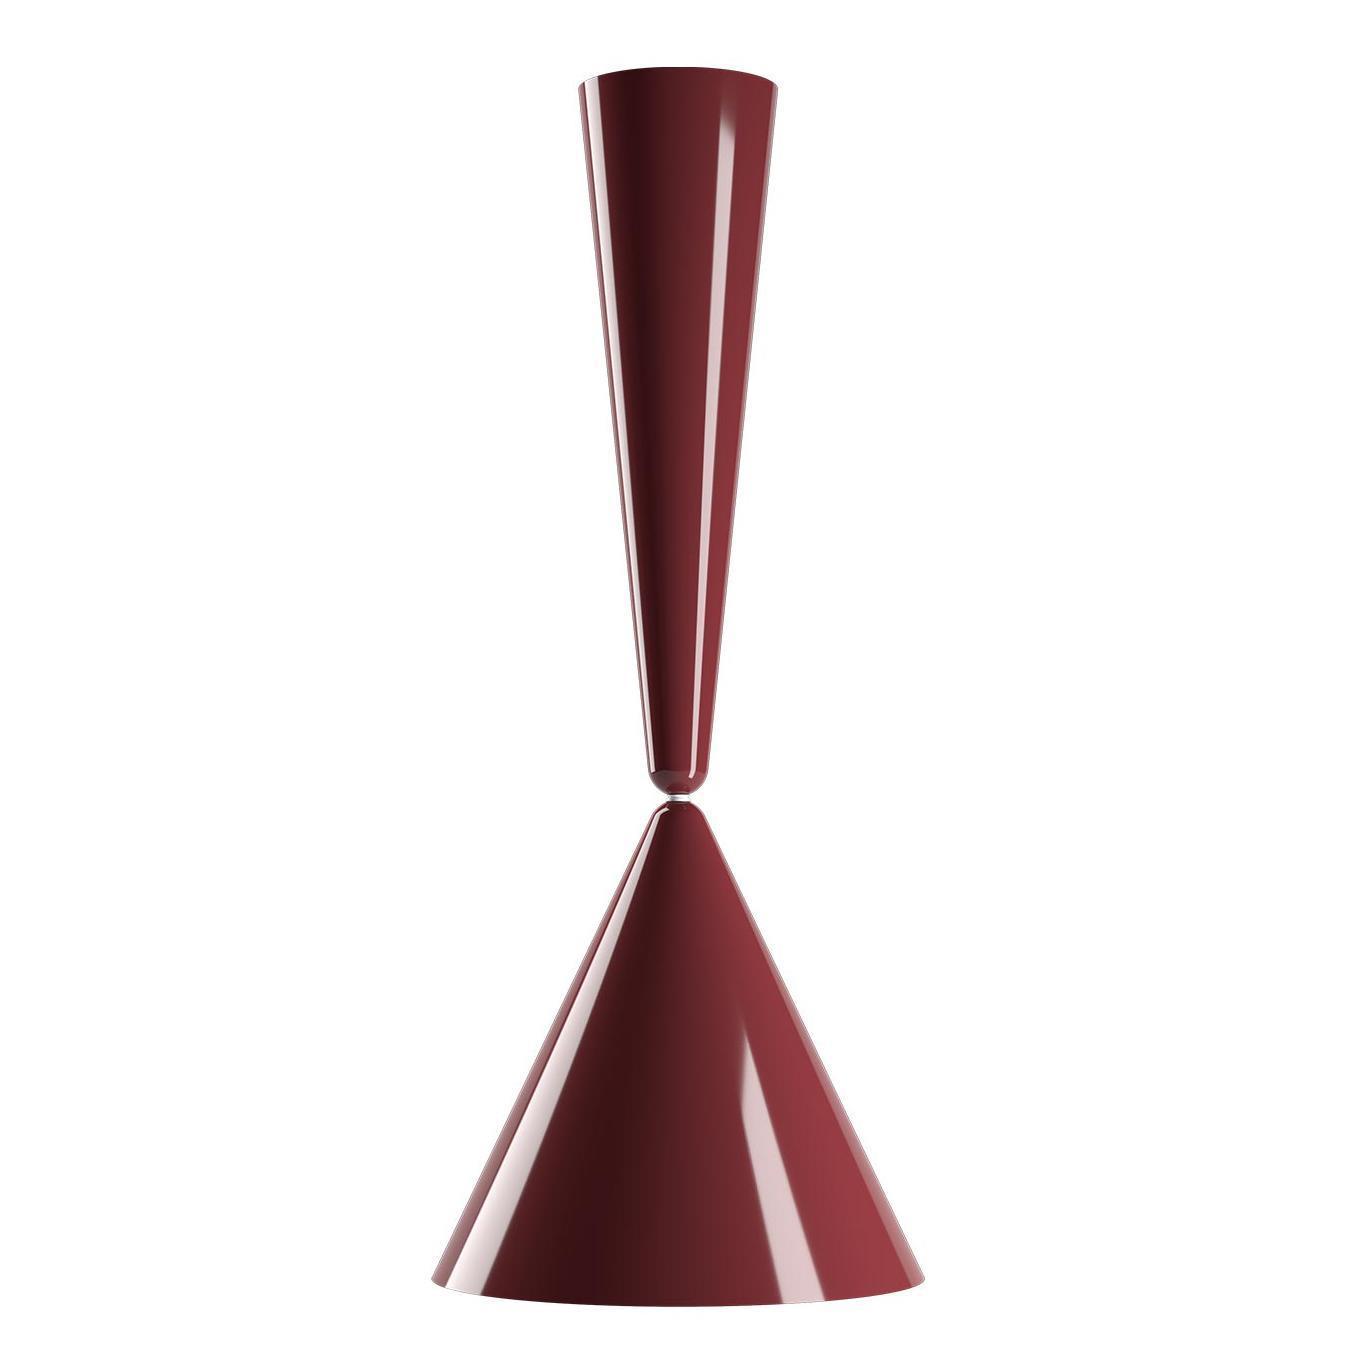 FonQ-Flos Diabolo hanglamp LED cherry red-aanbieding